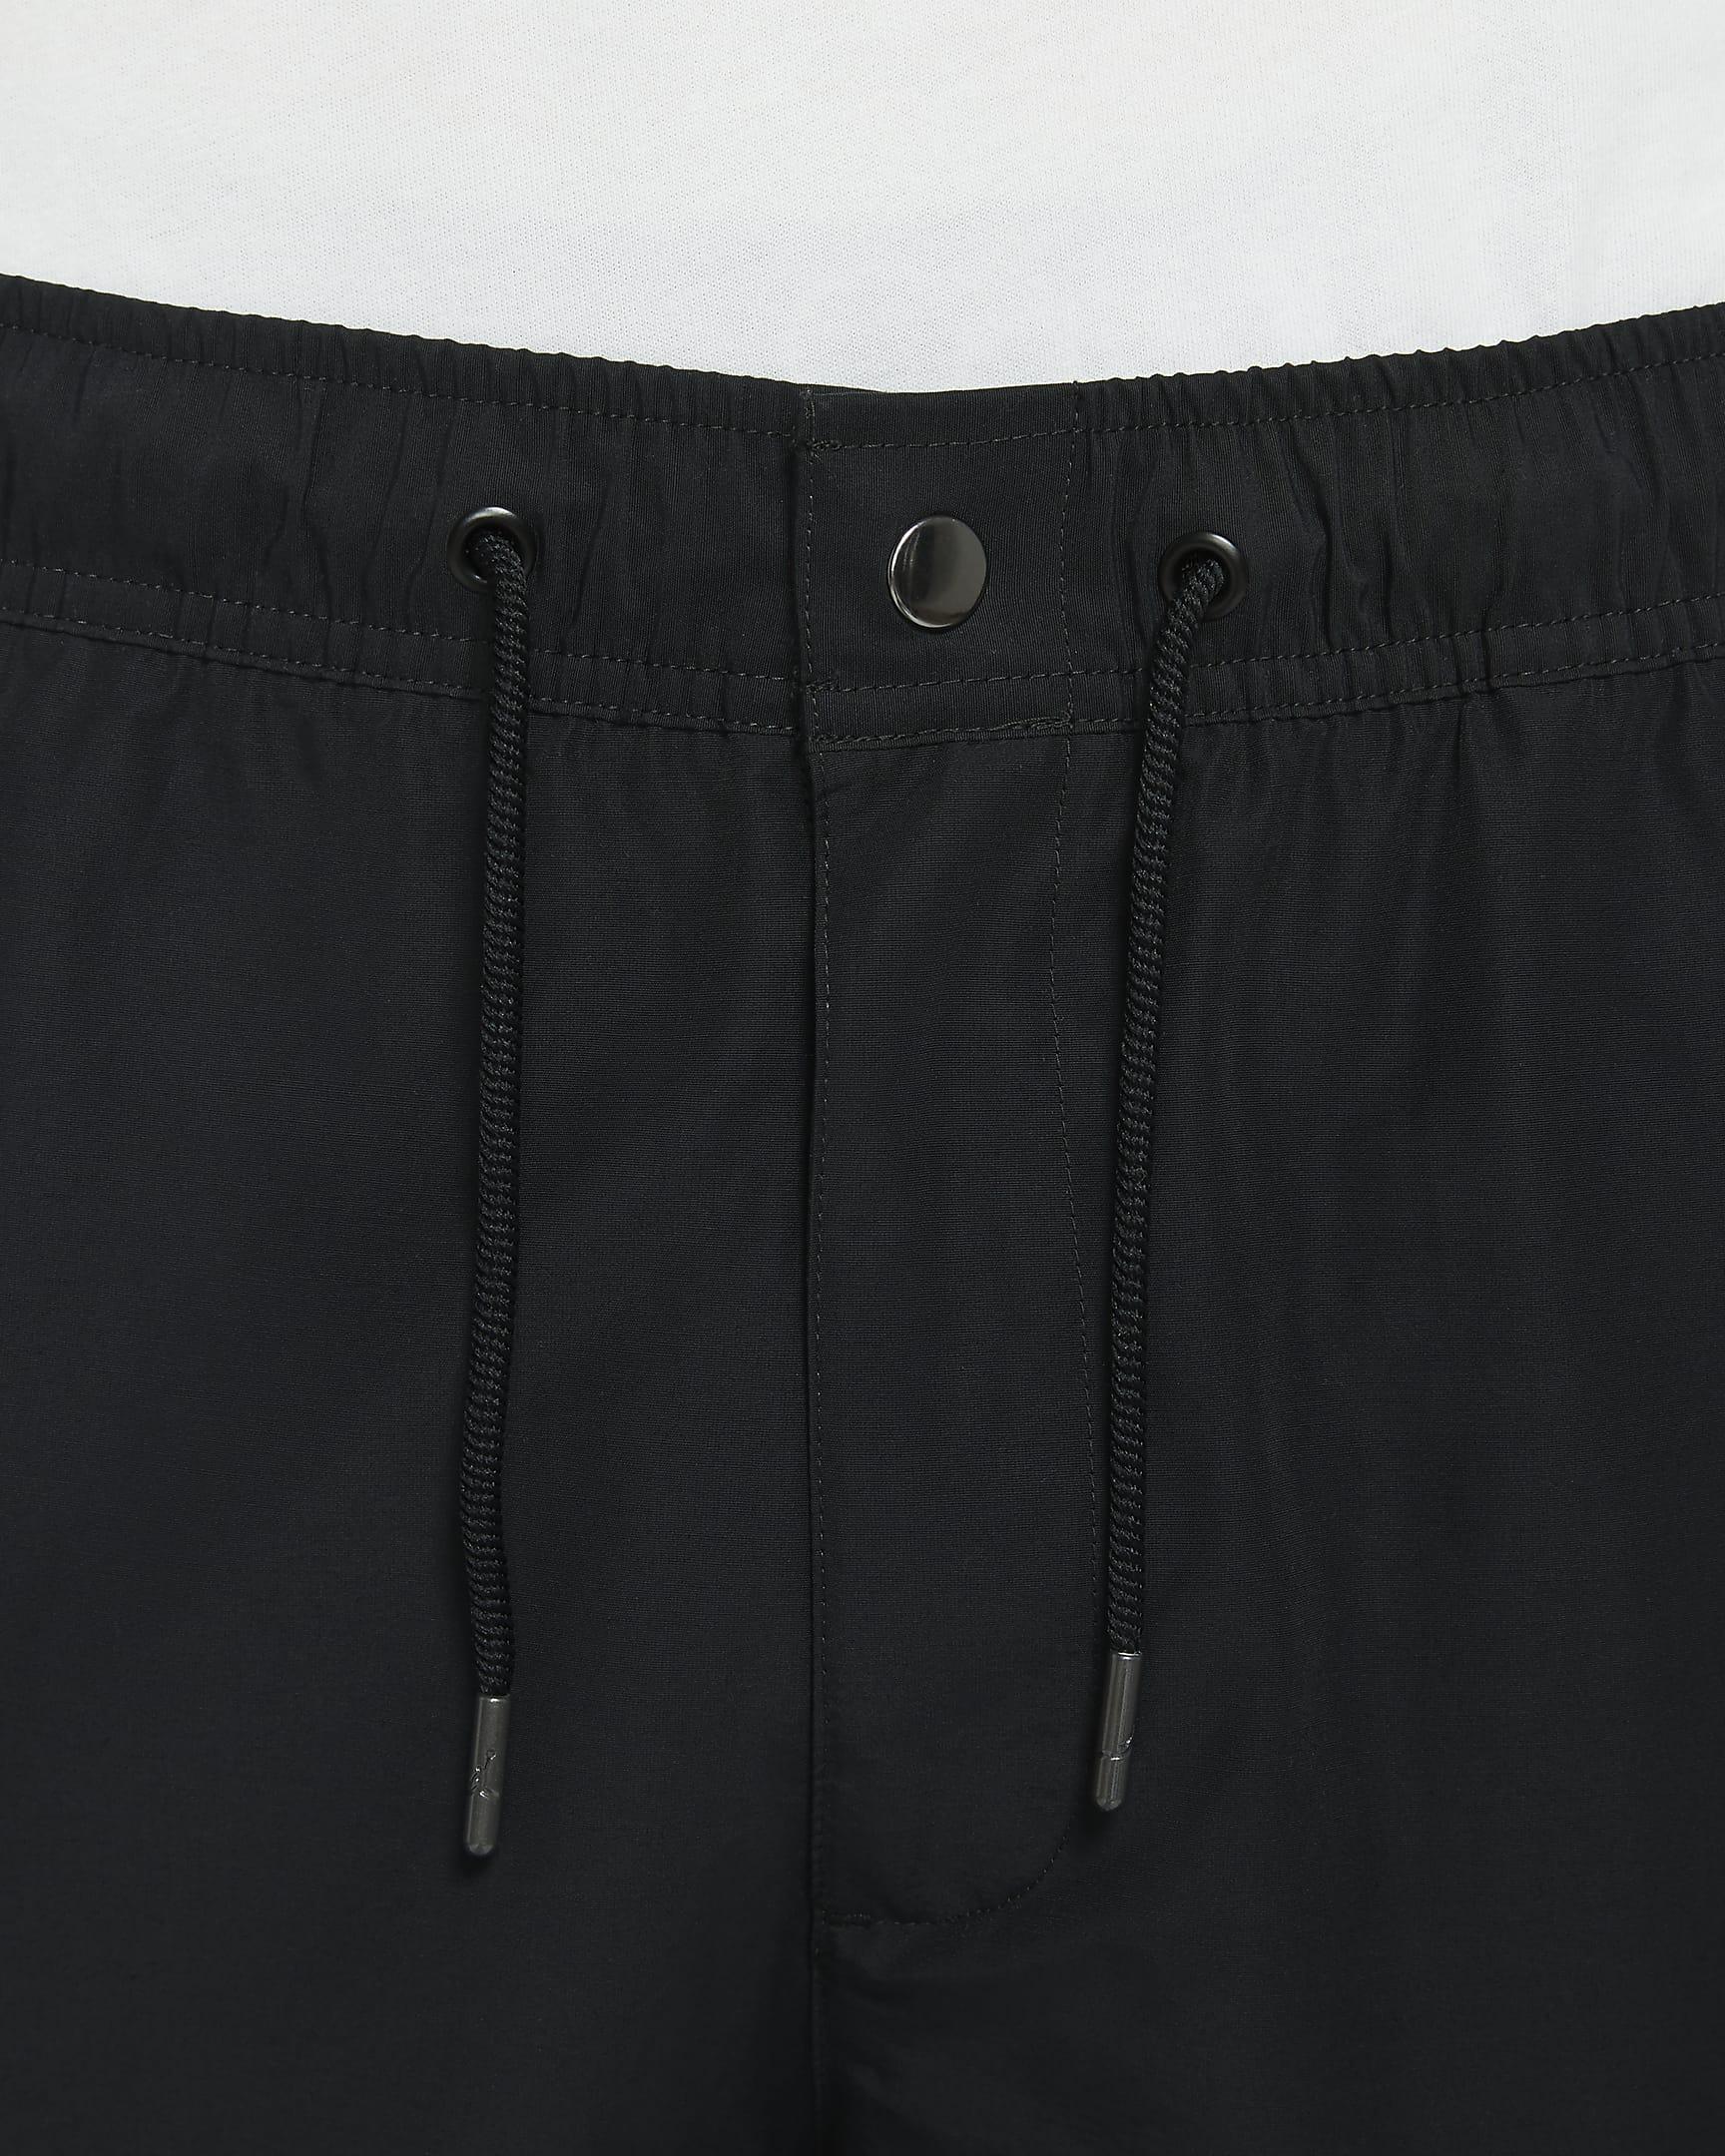 jordan-flight-mens-woven-pants-plT7Sv-2